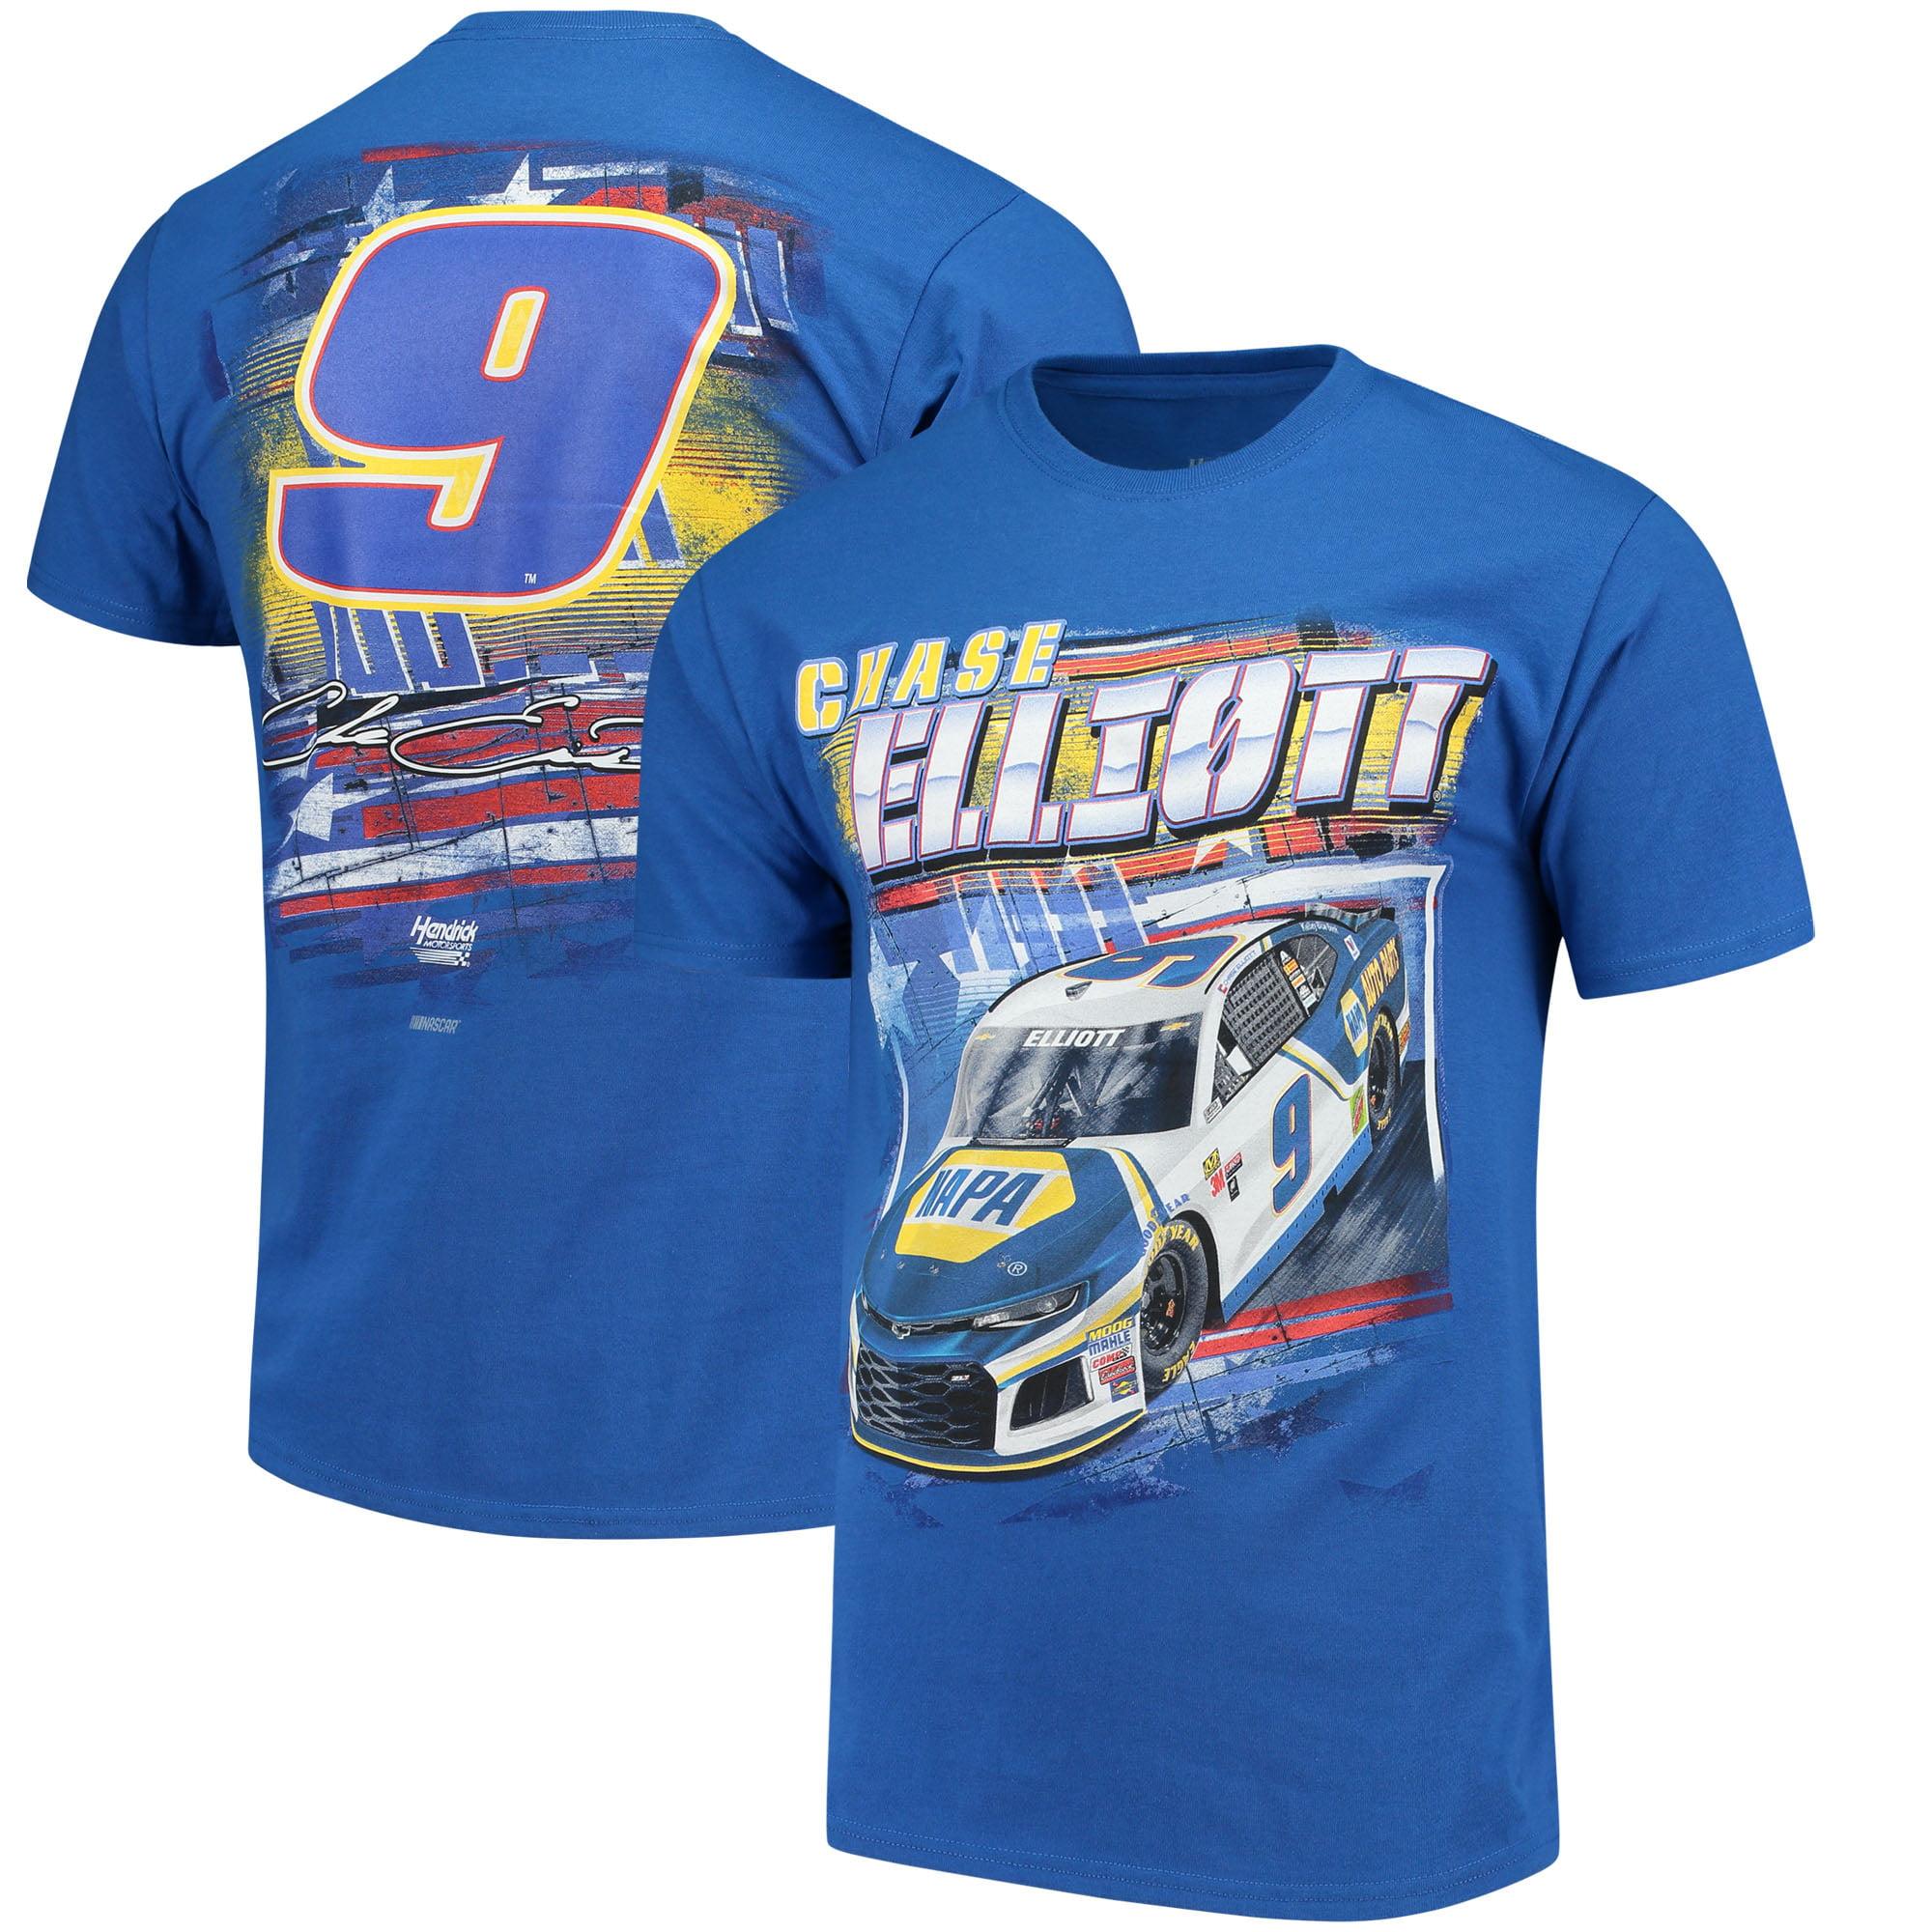 Chase Elliott Hendrick Motorsports Team Collection NAPA Patriotic T-Shirt - Royal